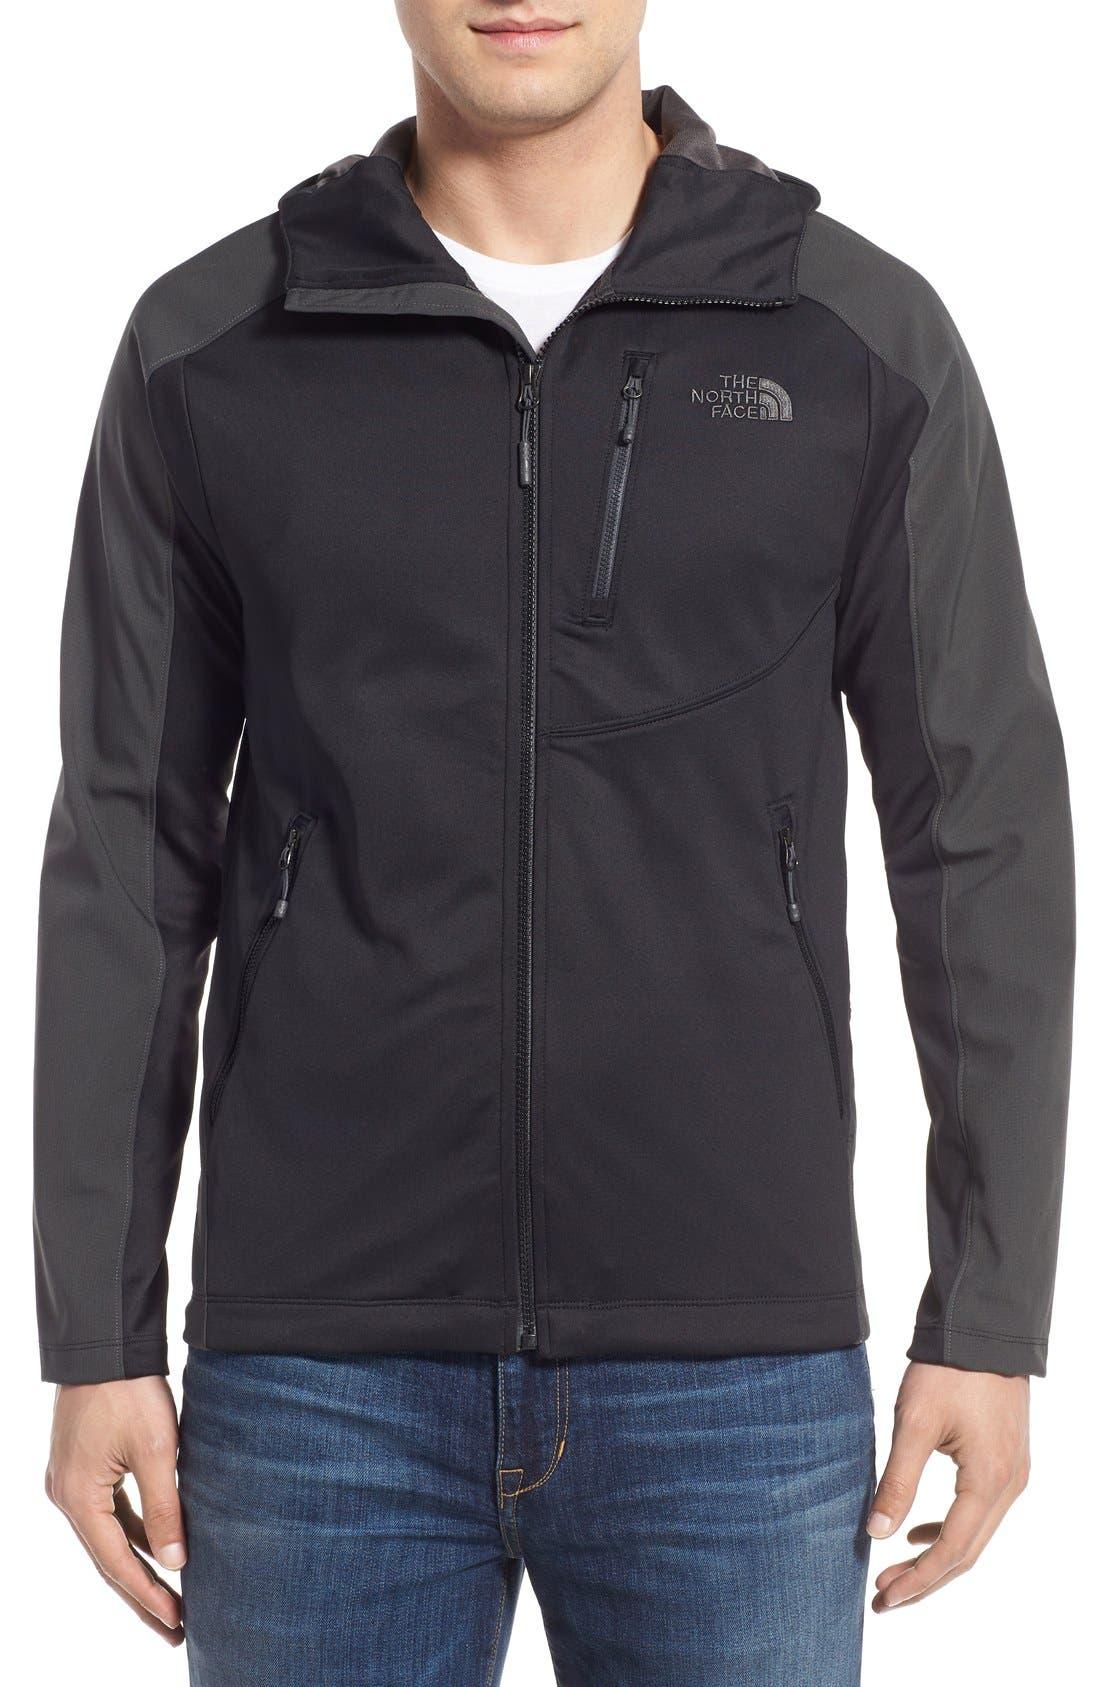 Tenacious Active Fit Hooded Jacket,                         Main,                         color, 010